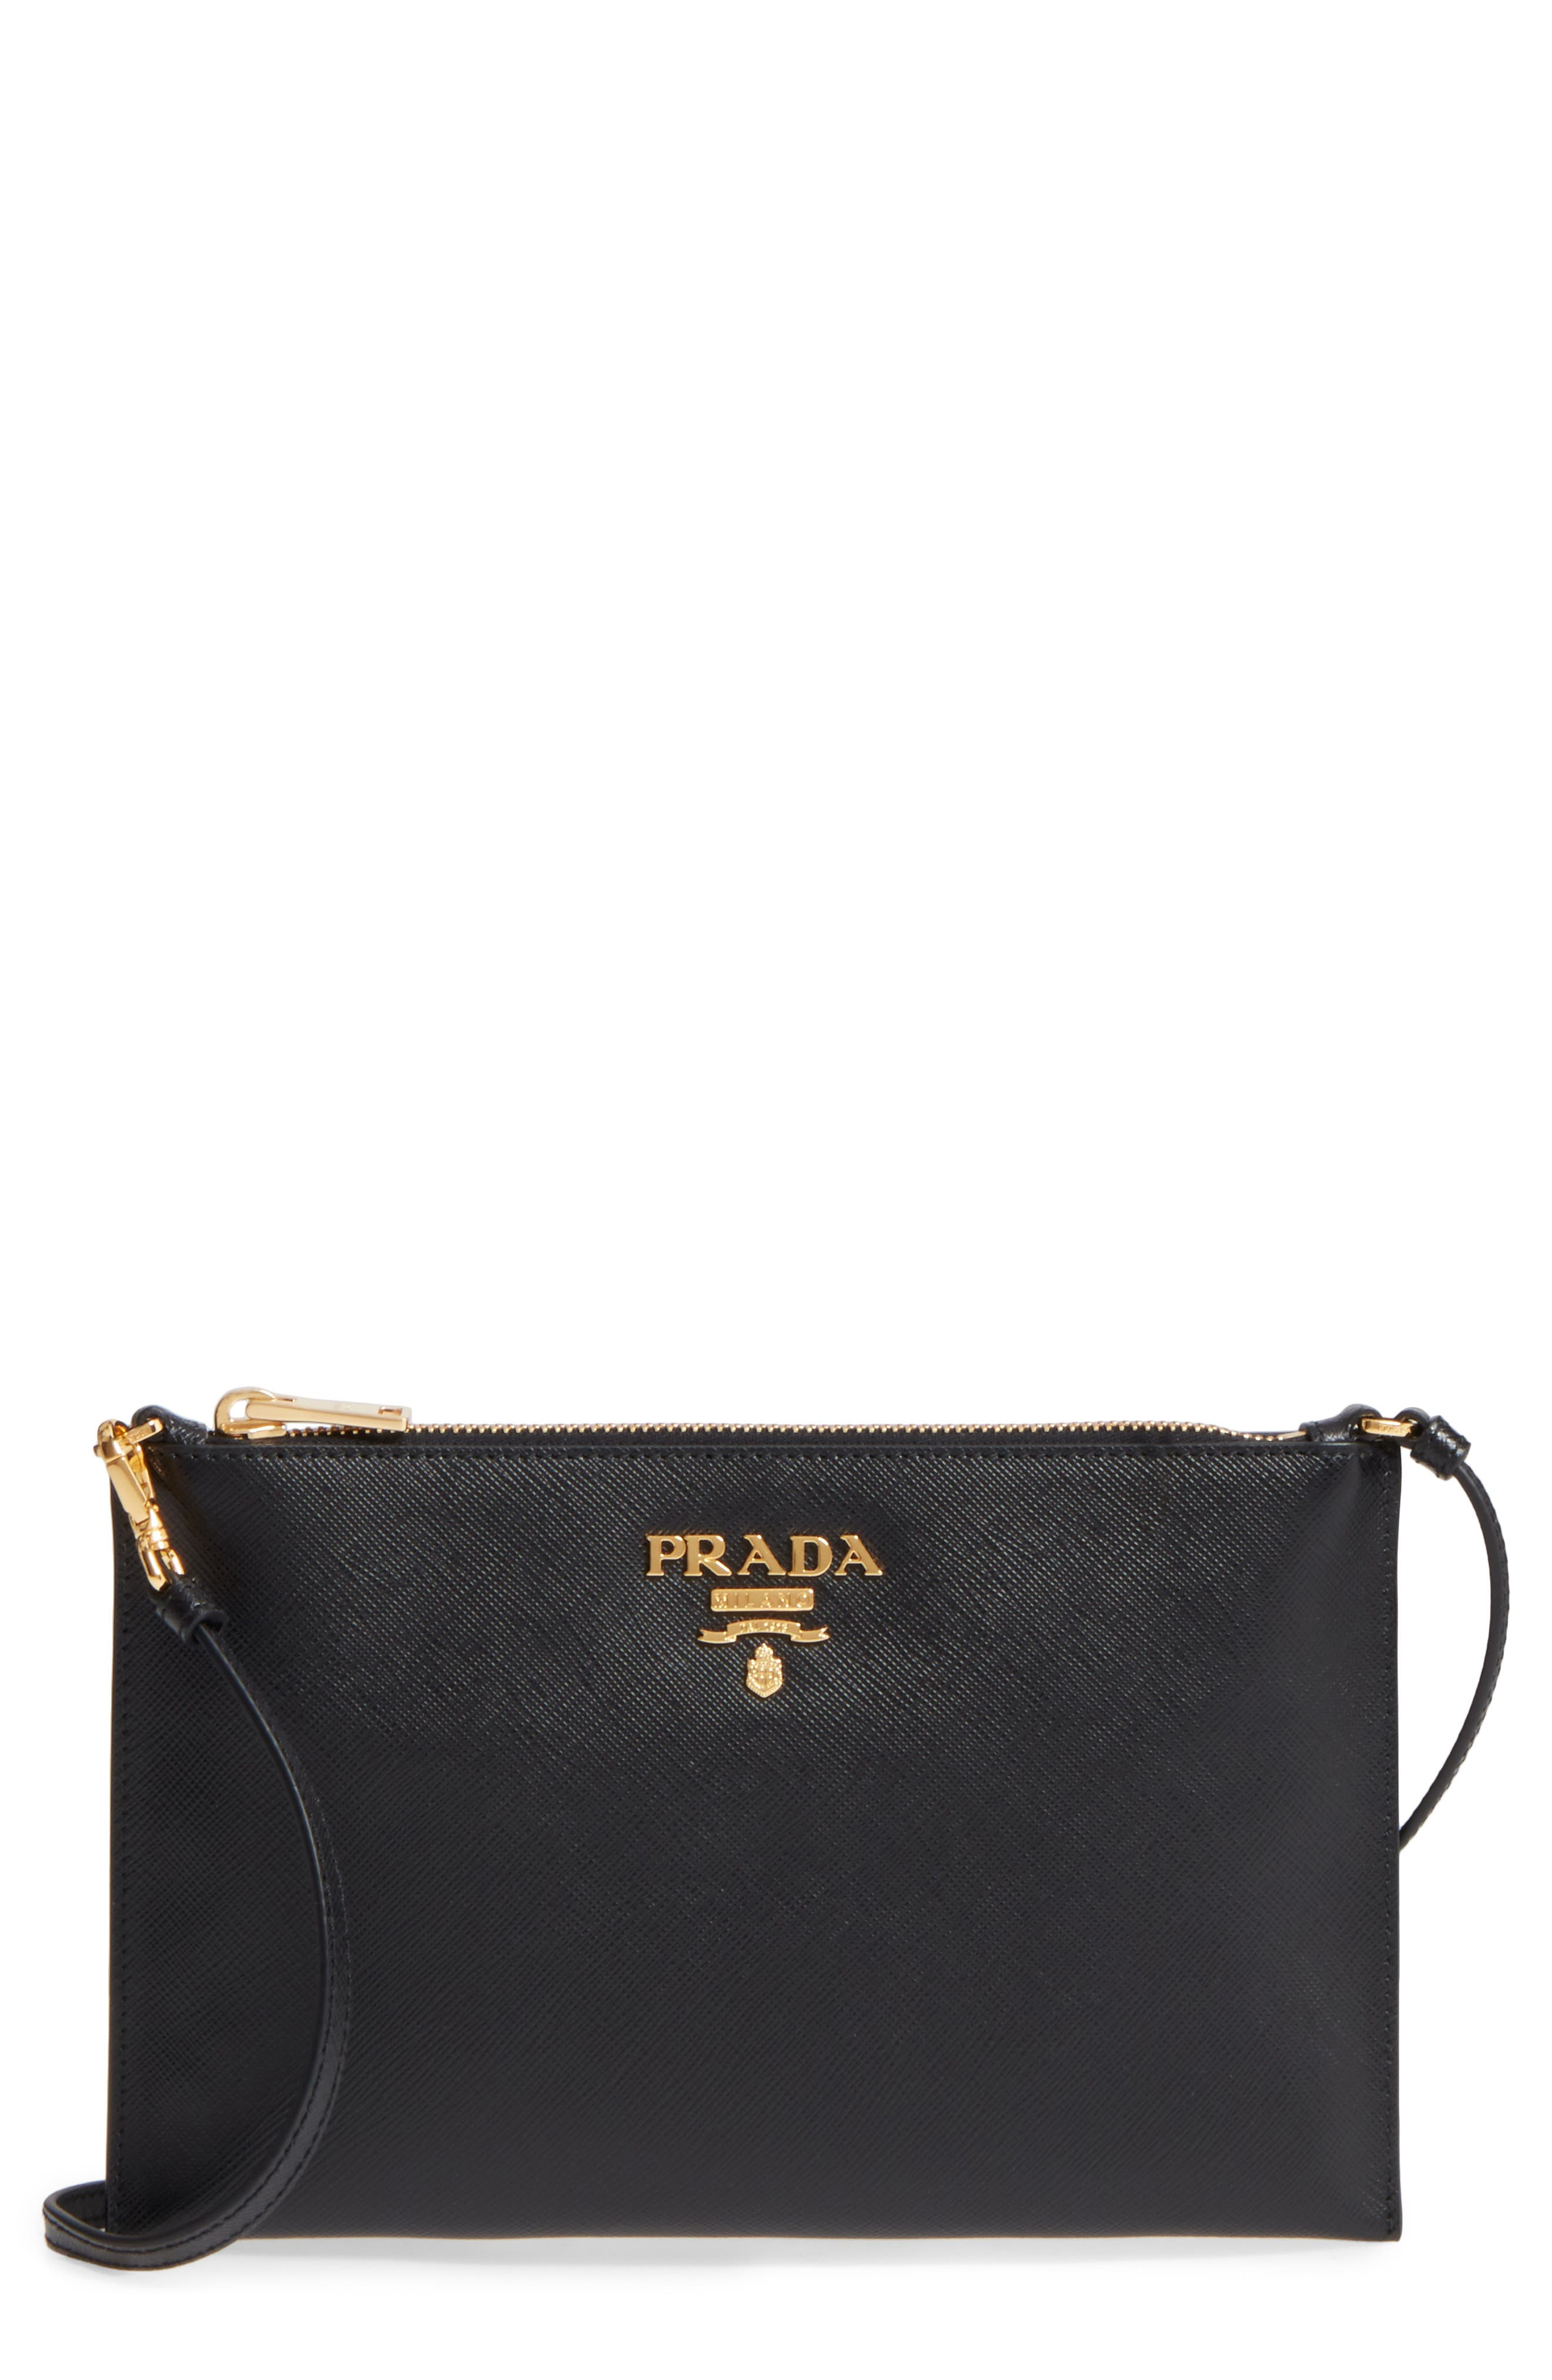 Small Saffiano Leather Shoulder Bag,                             Main thumbnail 1, color,                             F0002 NERO